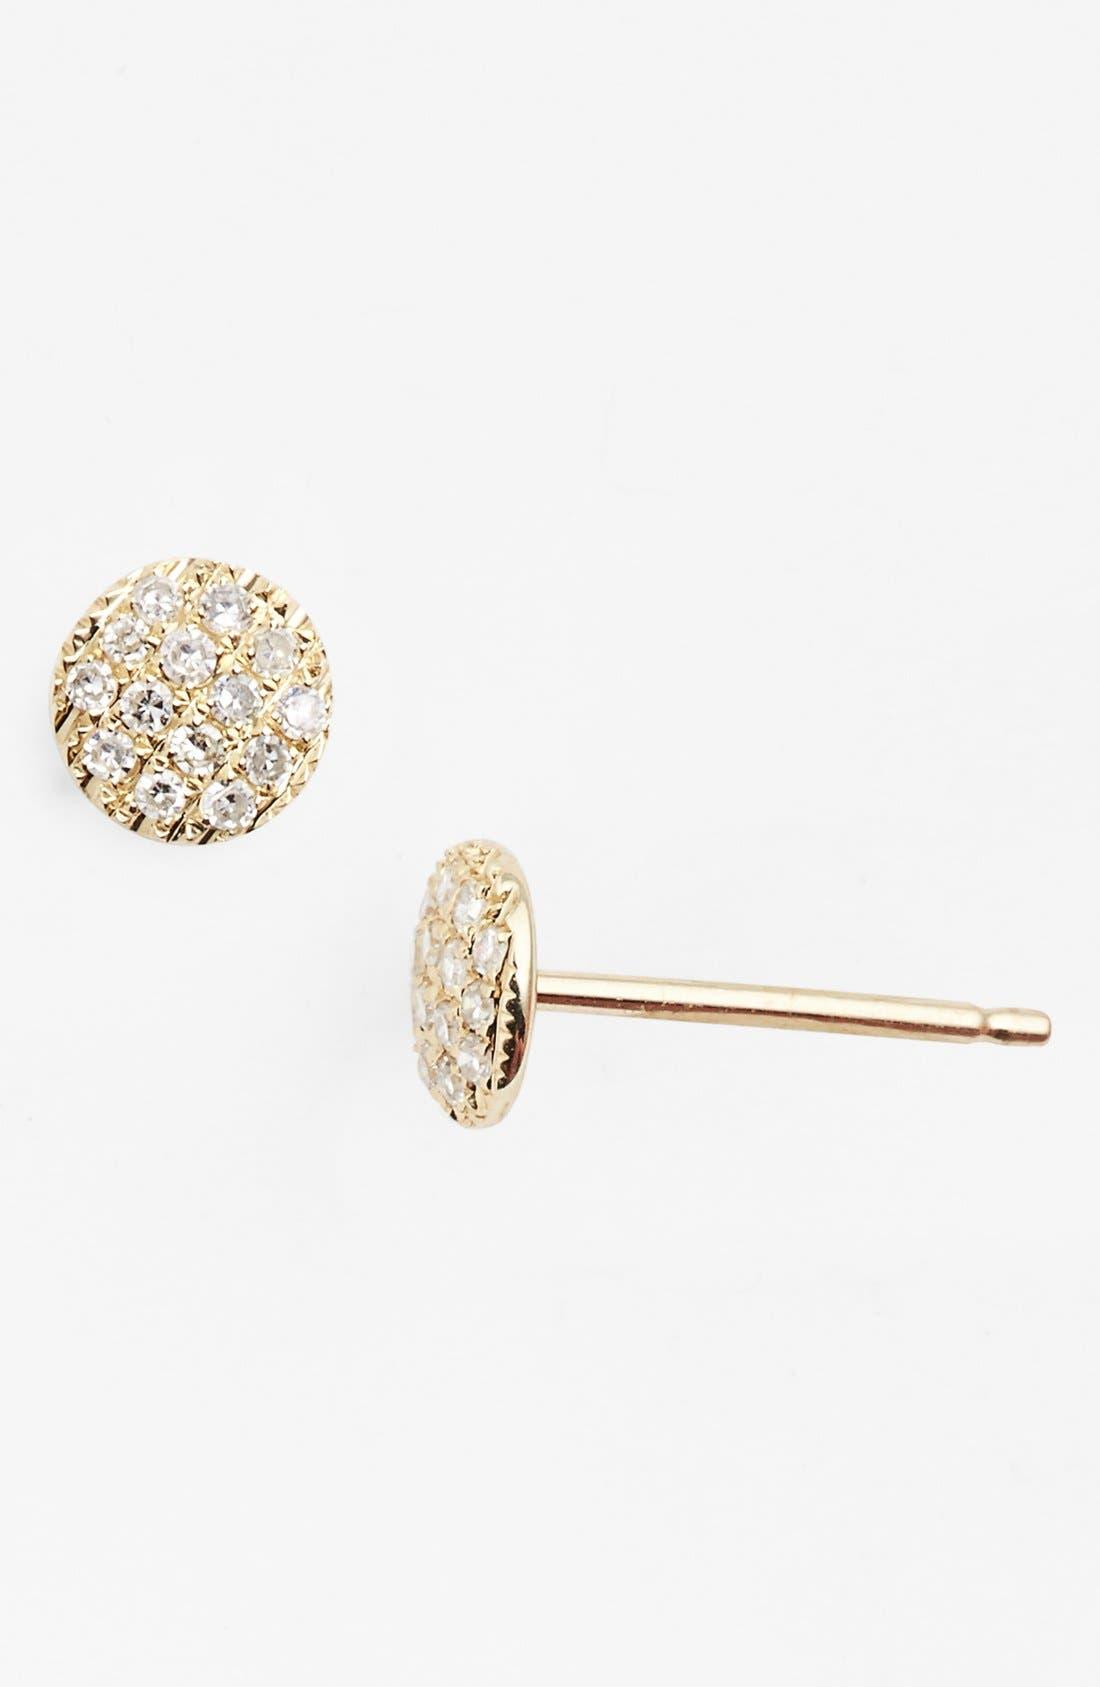 Alternate Image 1 Selected - Dana Rebecca Designs 'Lauren Joy' Diamond Disc Stud Earrings